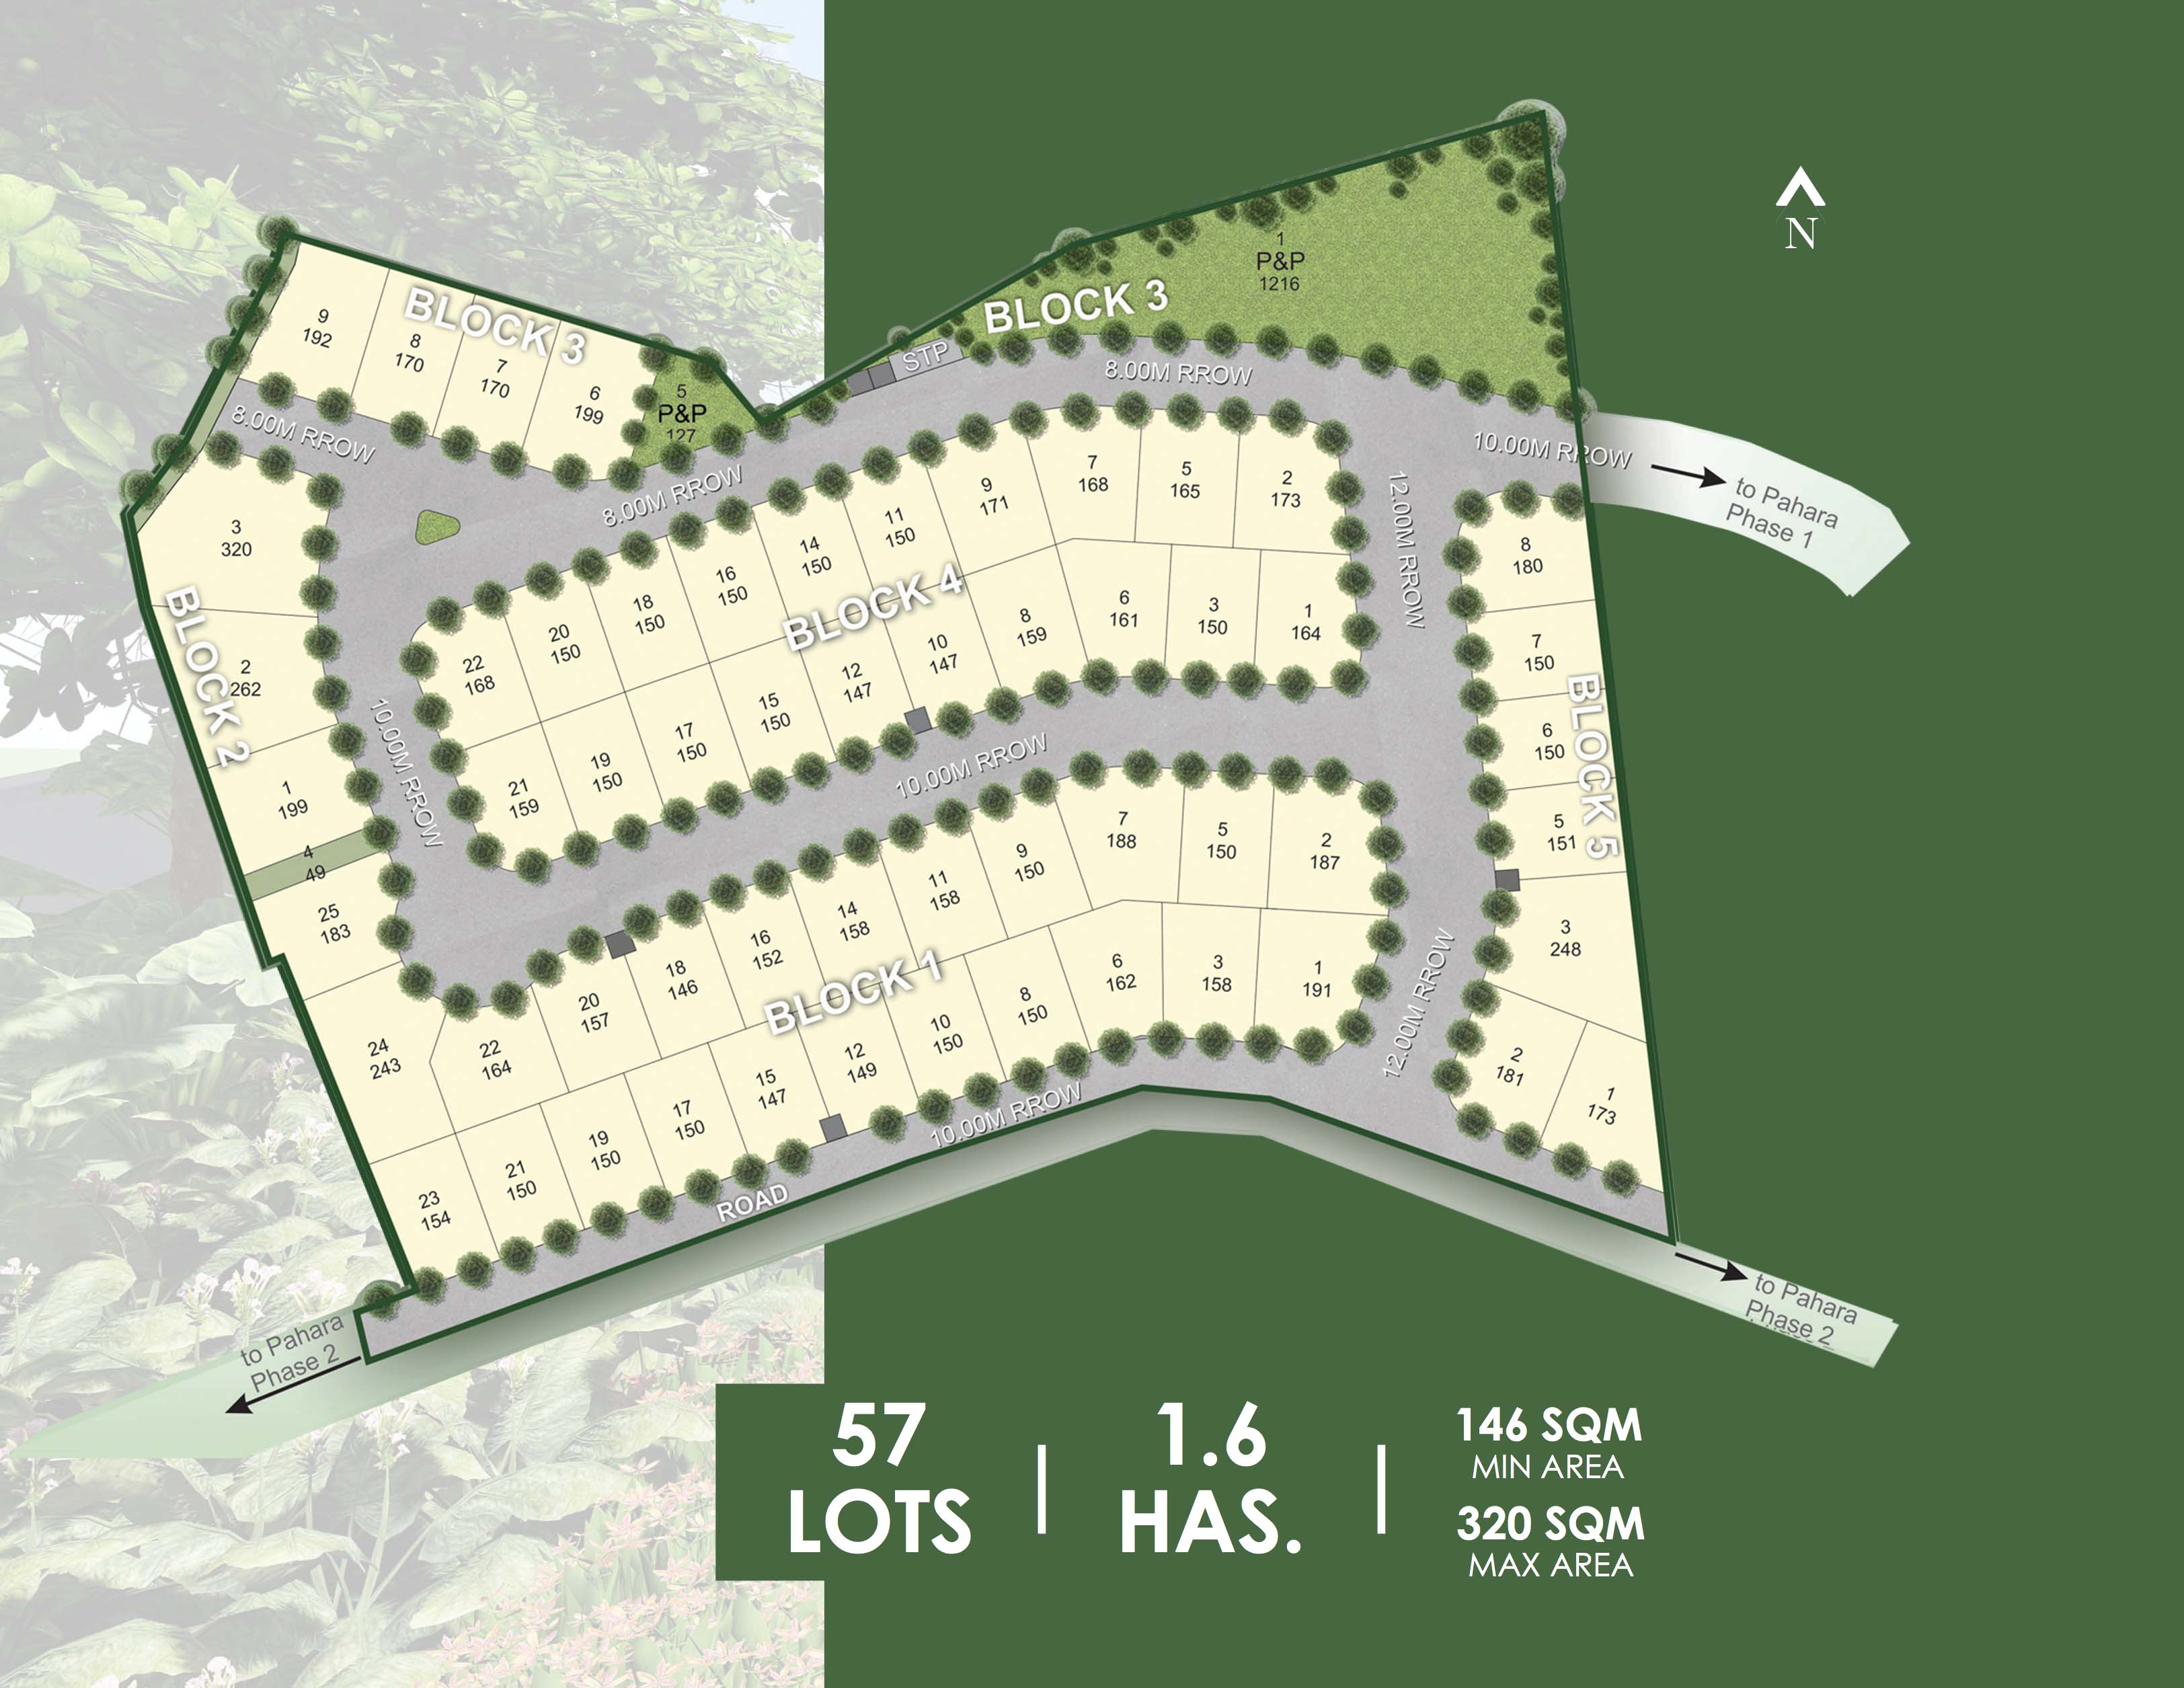 The Upland Estates